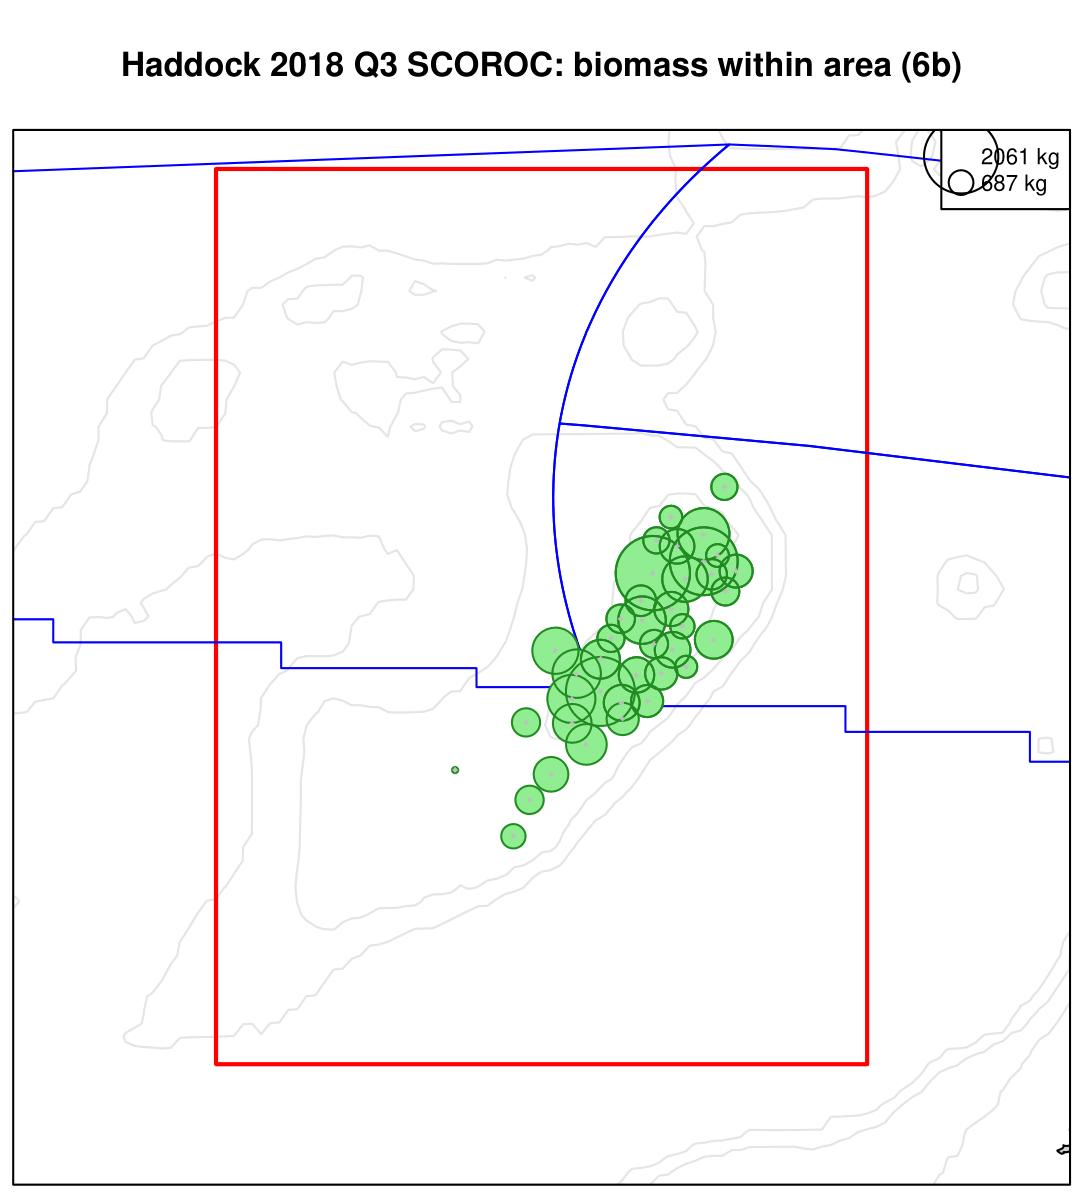 Haddock 2018 Q3 SCOROC: biomass within area (6b)